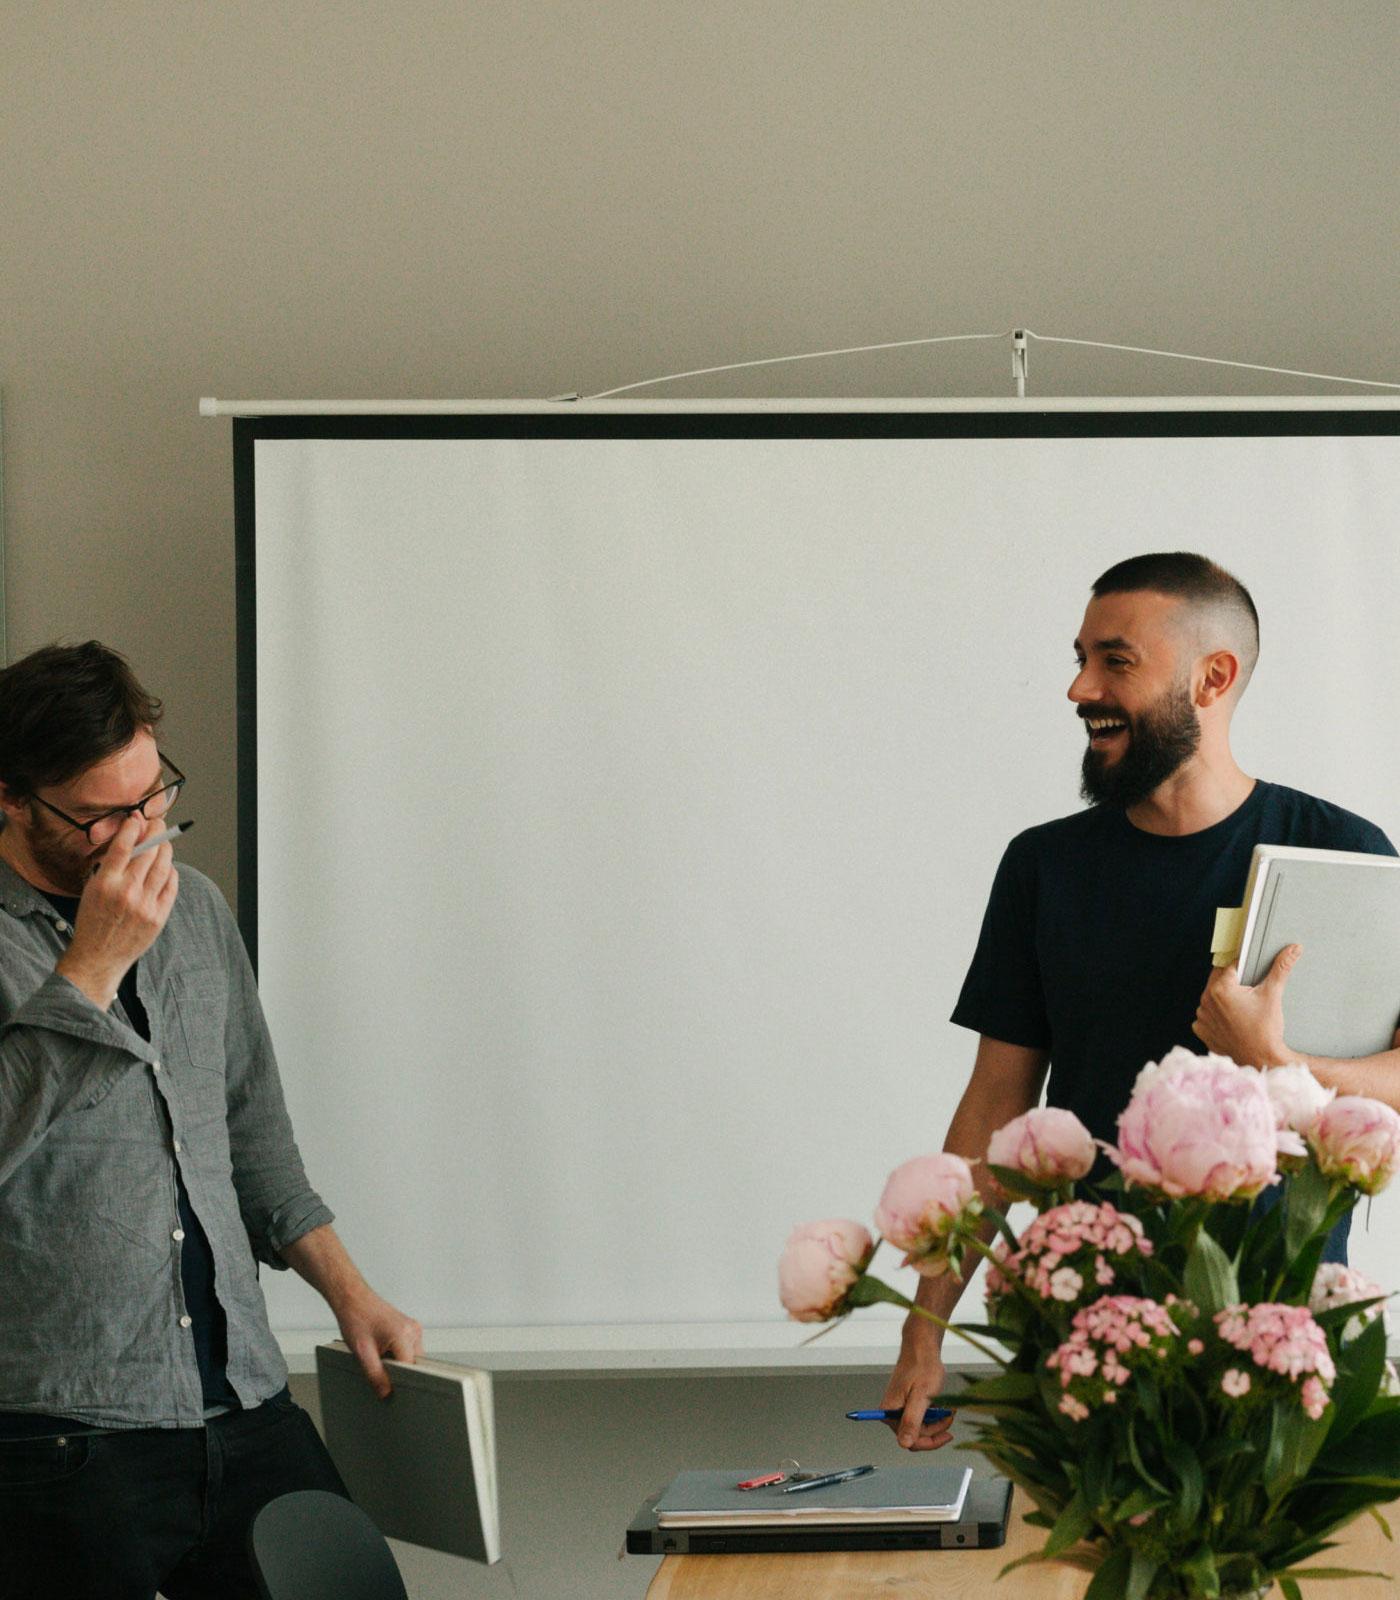 ctrl QS team members laughing standing in a meeting room